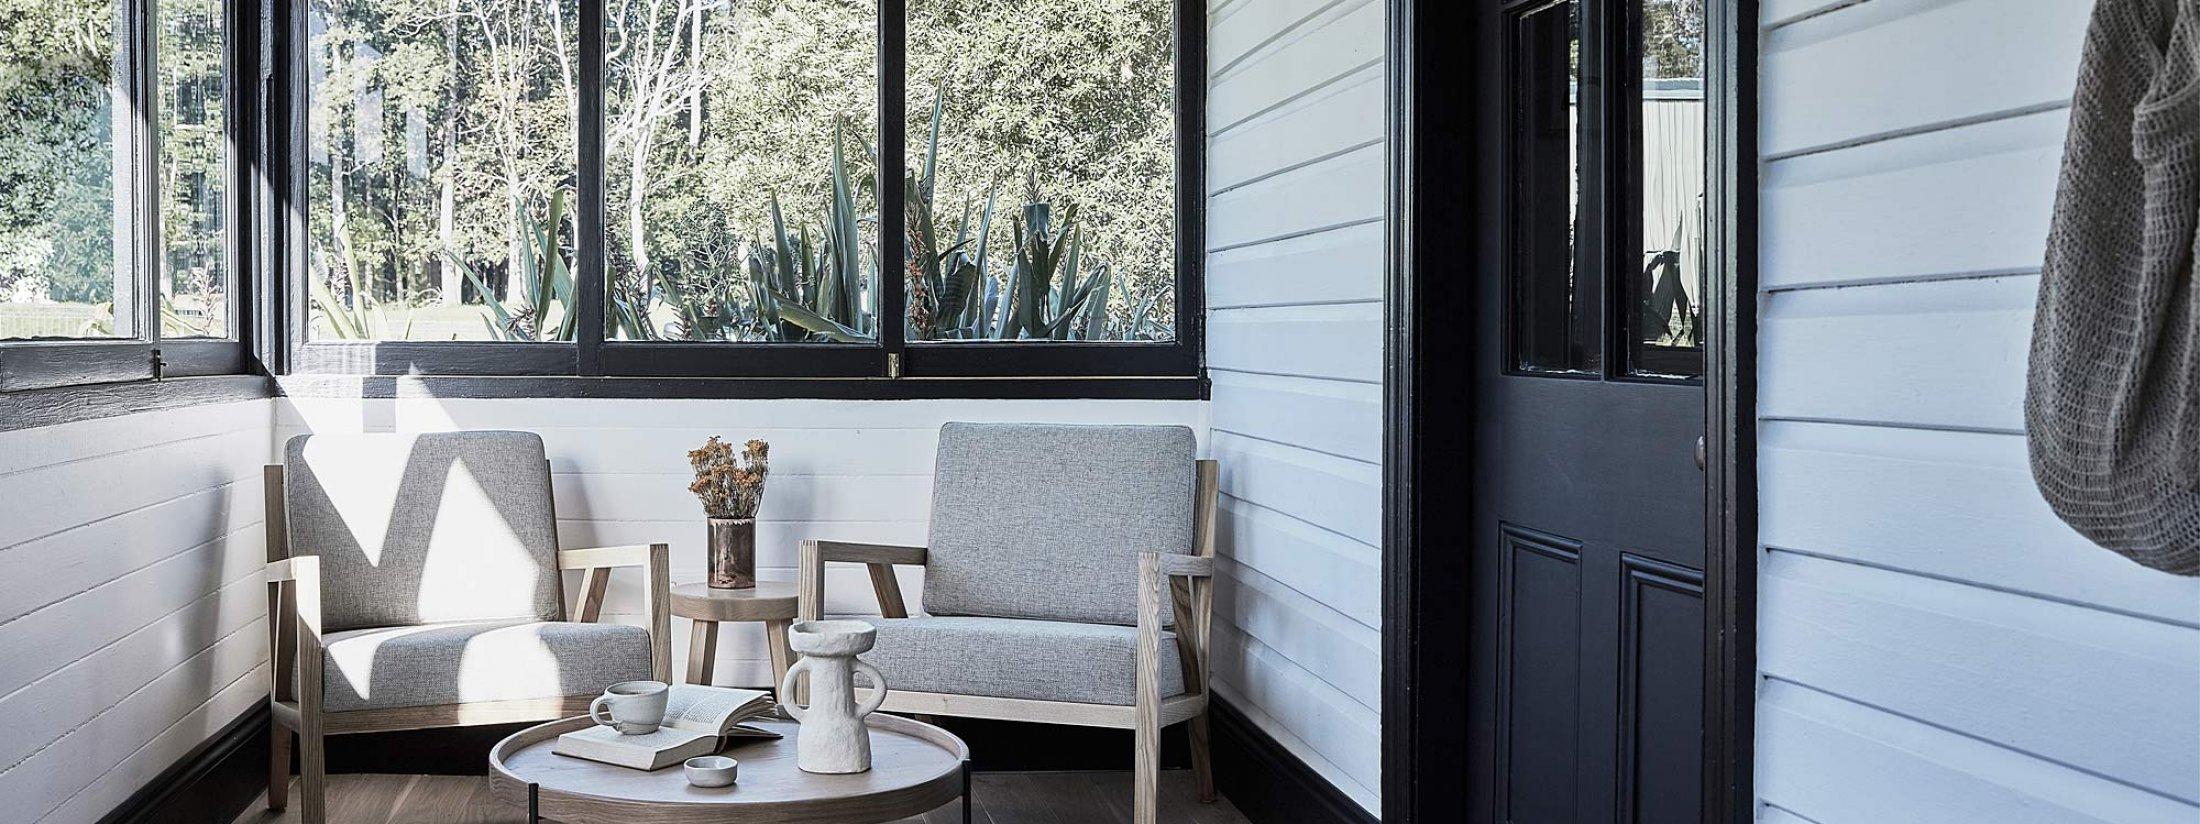 Bennys Cottage - Byron Bay - Real Living Shoot Veranda Seating